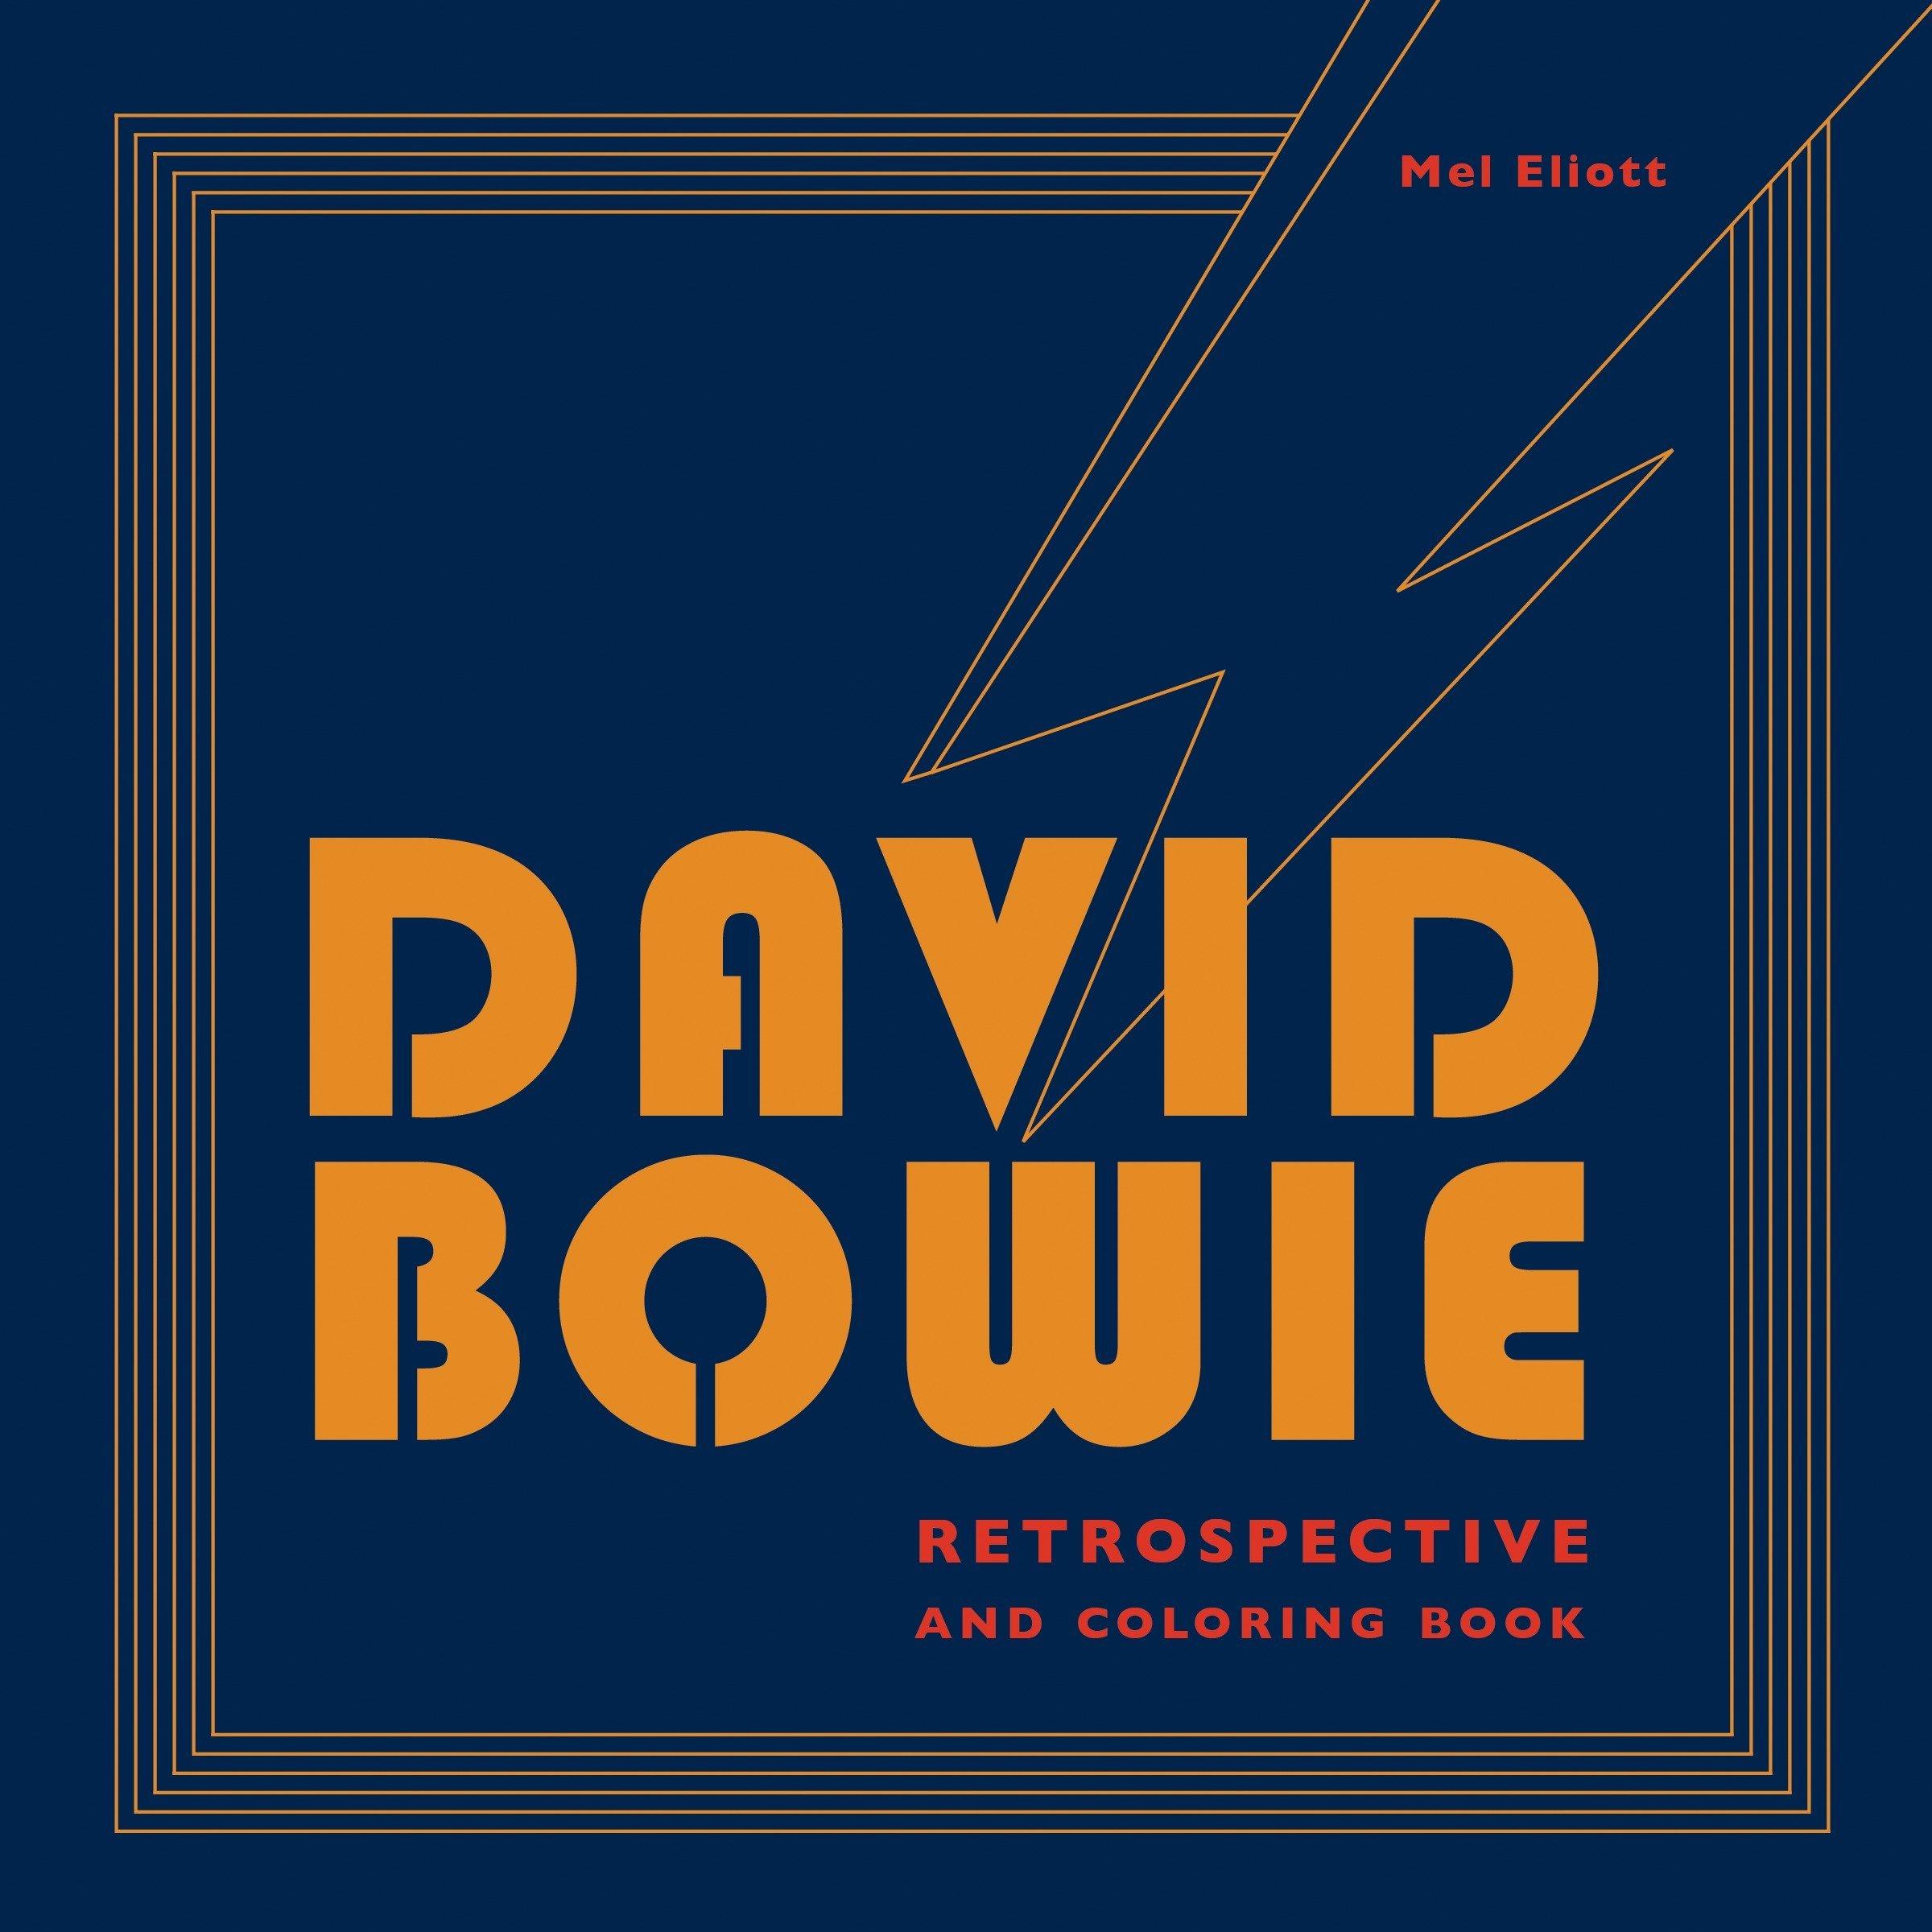 Amazon Com David Bowie Retrospective And Coloring Book